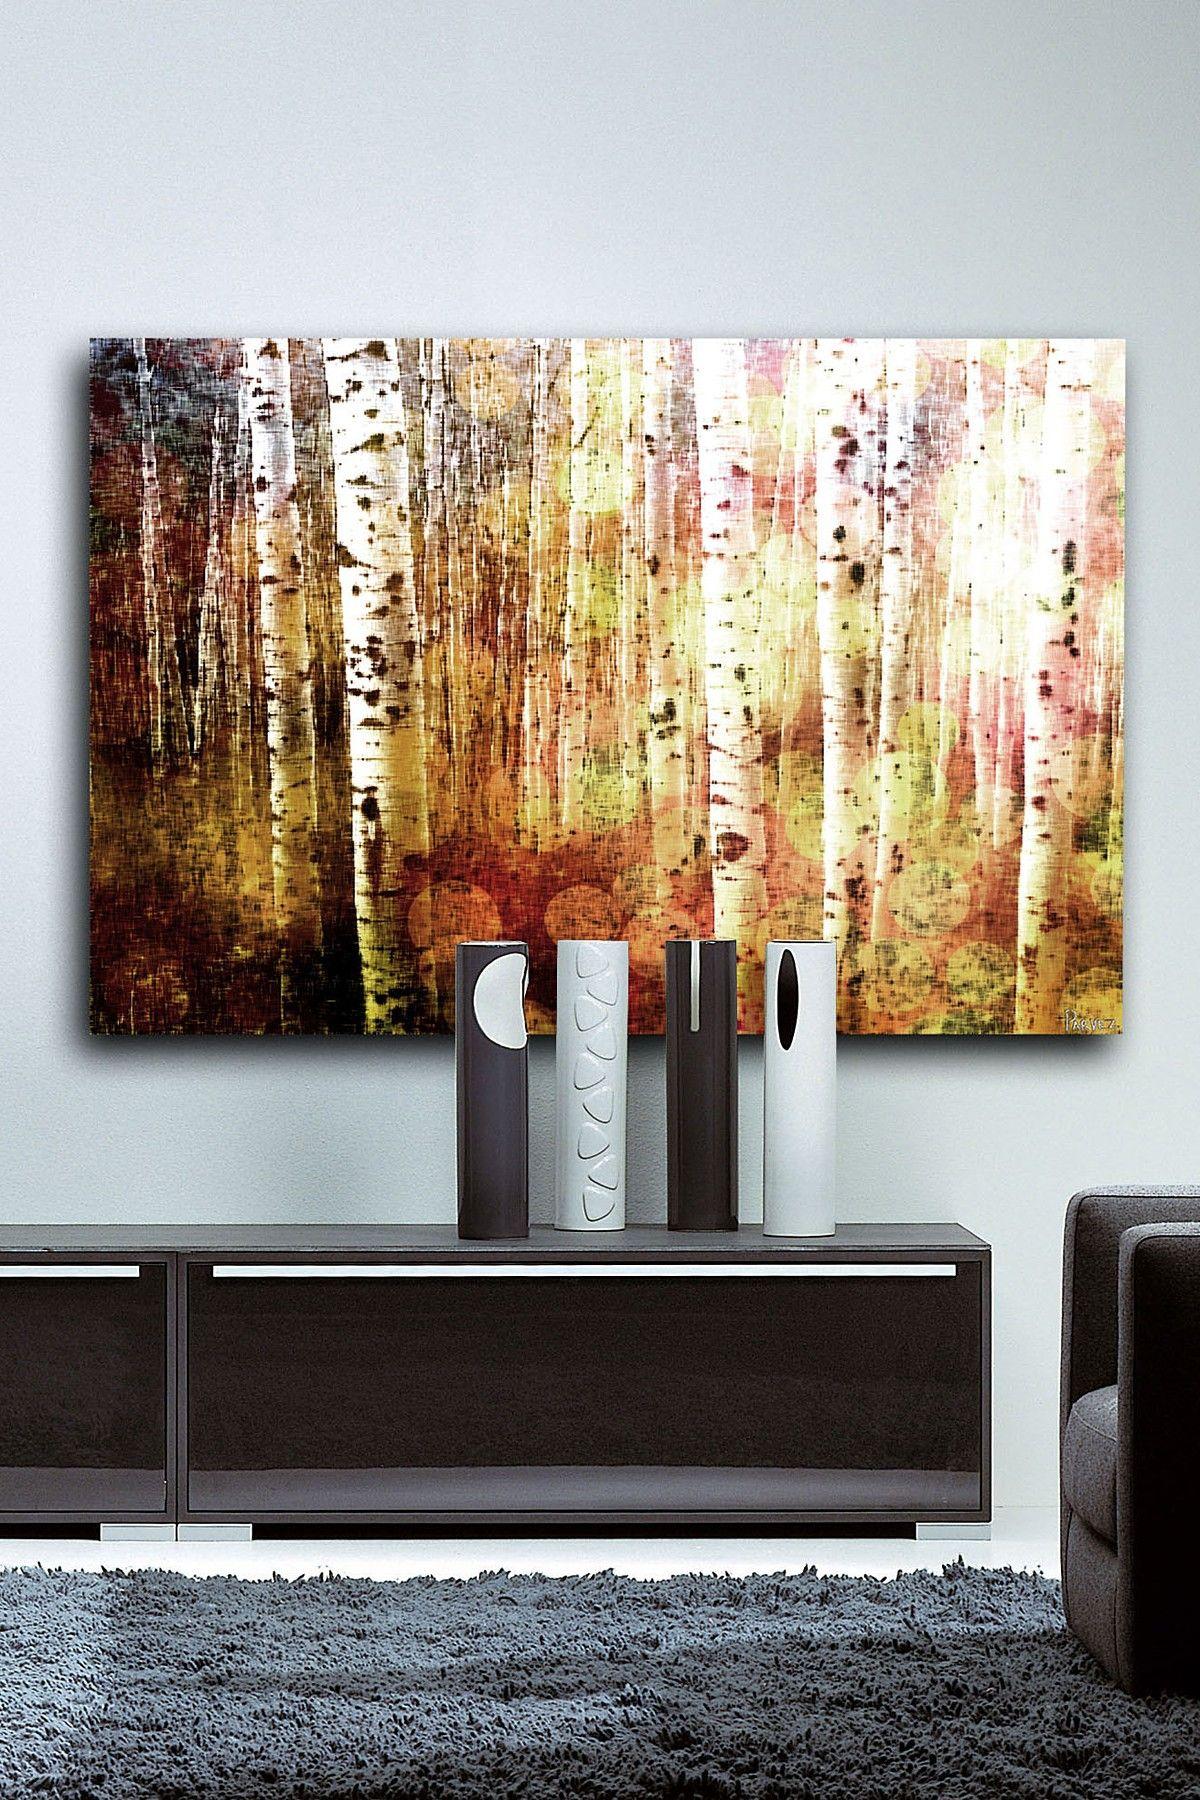 Aspen canvas wall art art pinterest aspen canvases and walls